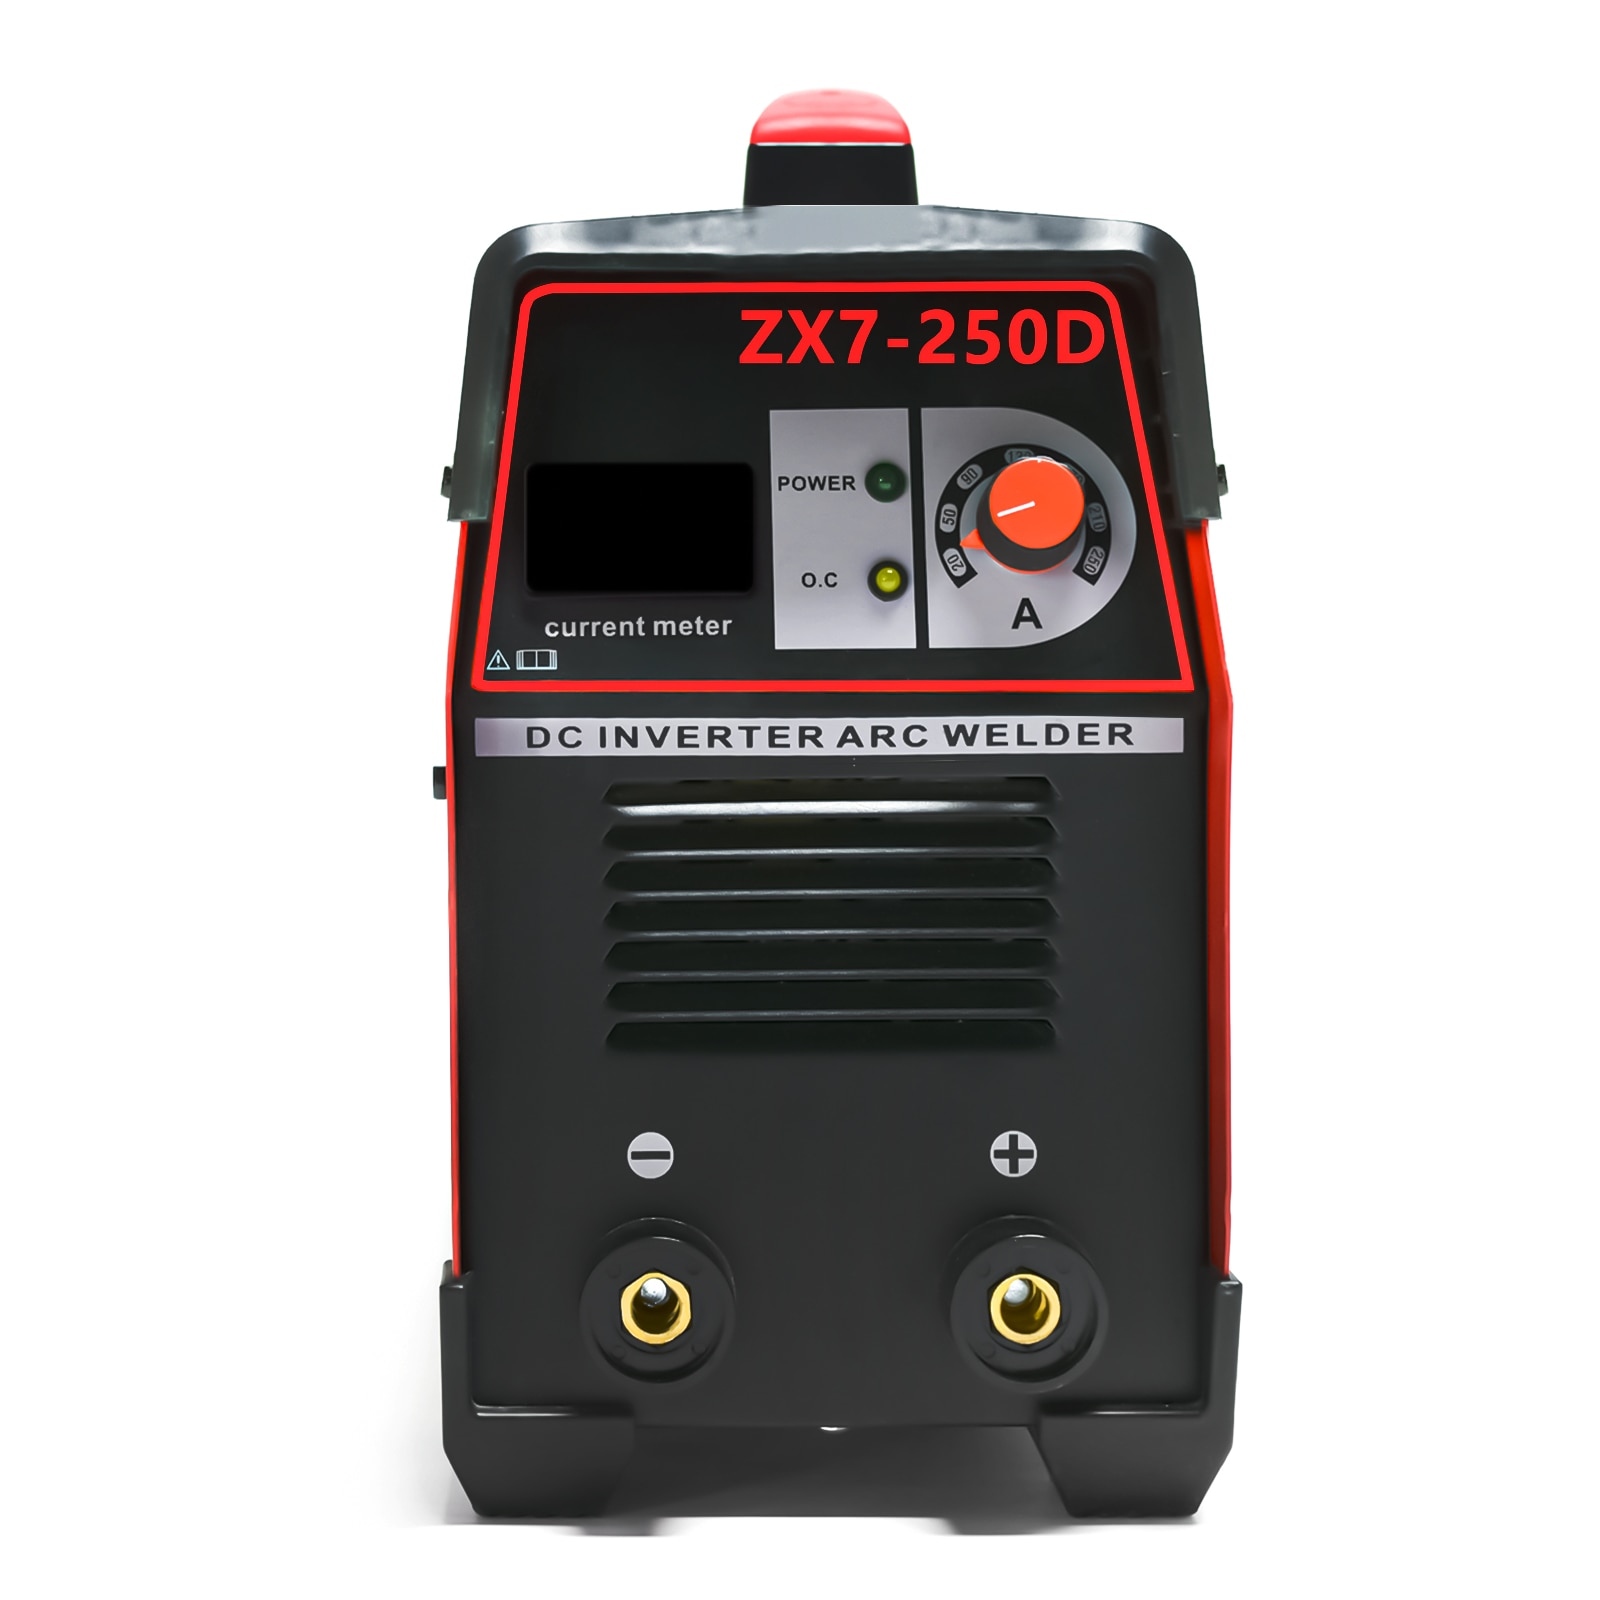 Welding inverter Semi-automatic Inverter ZX7-250D ARC MMA Portable Laser Welding Machine Support No Gas Welding 220V